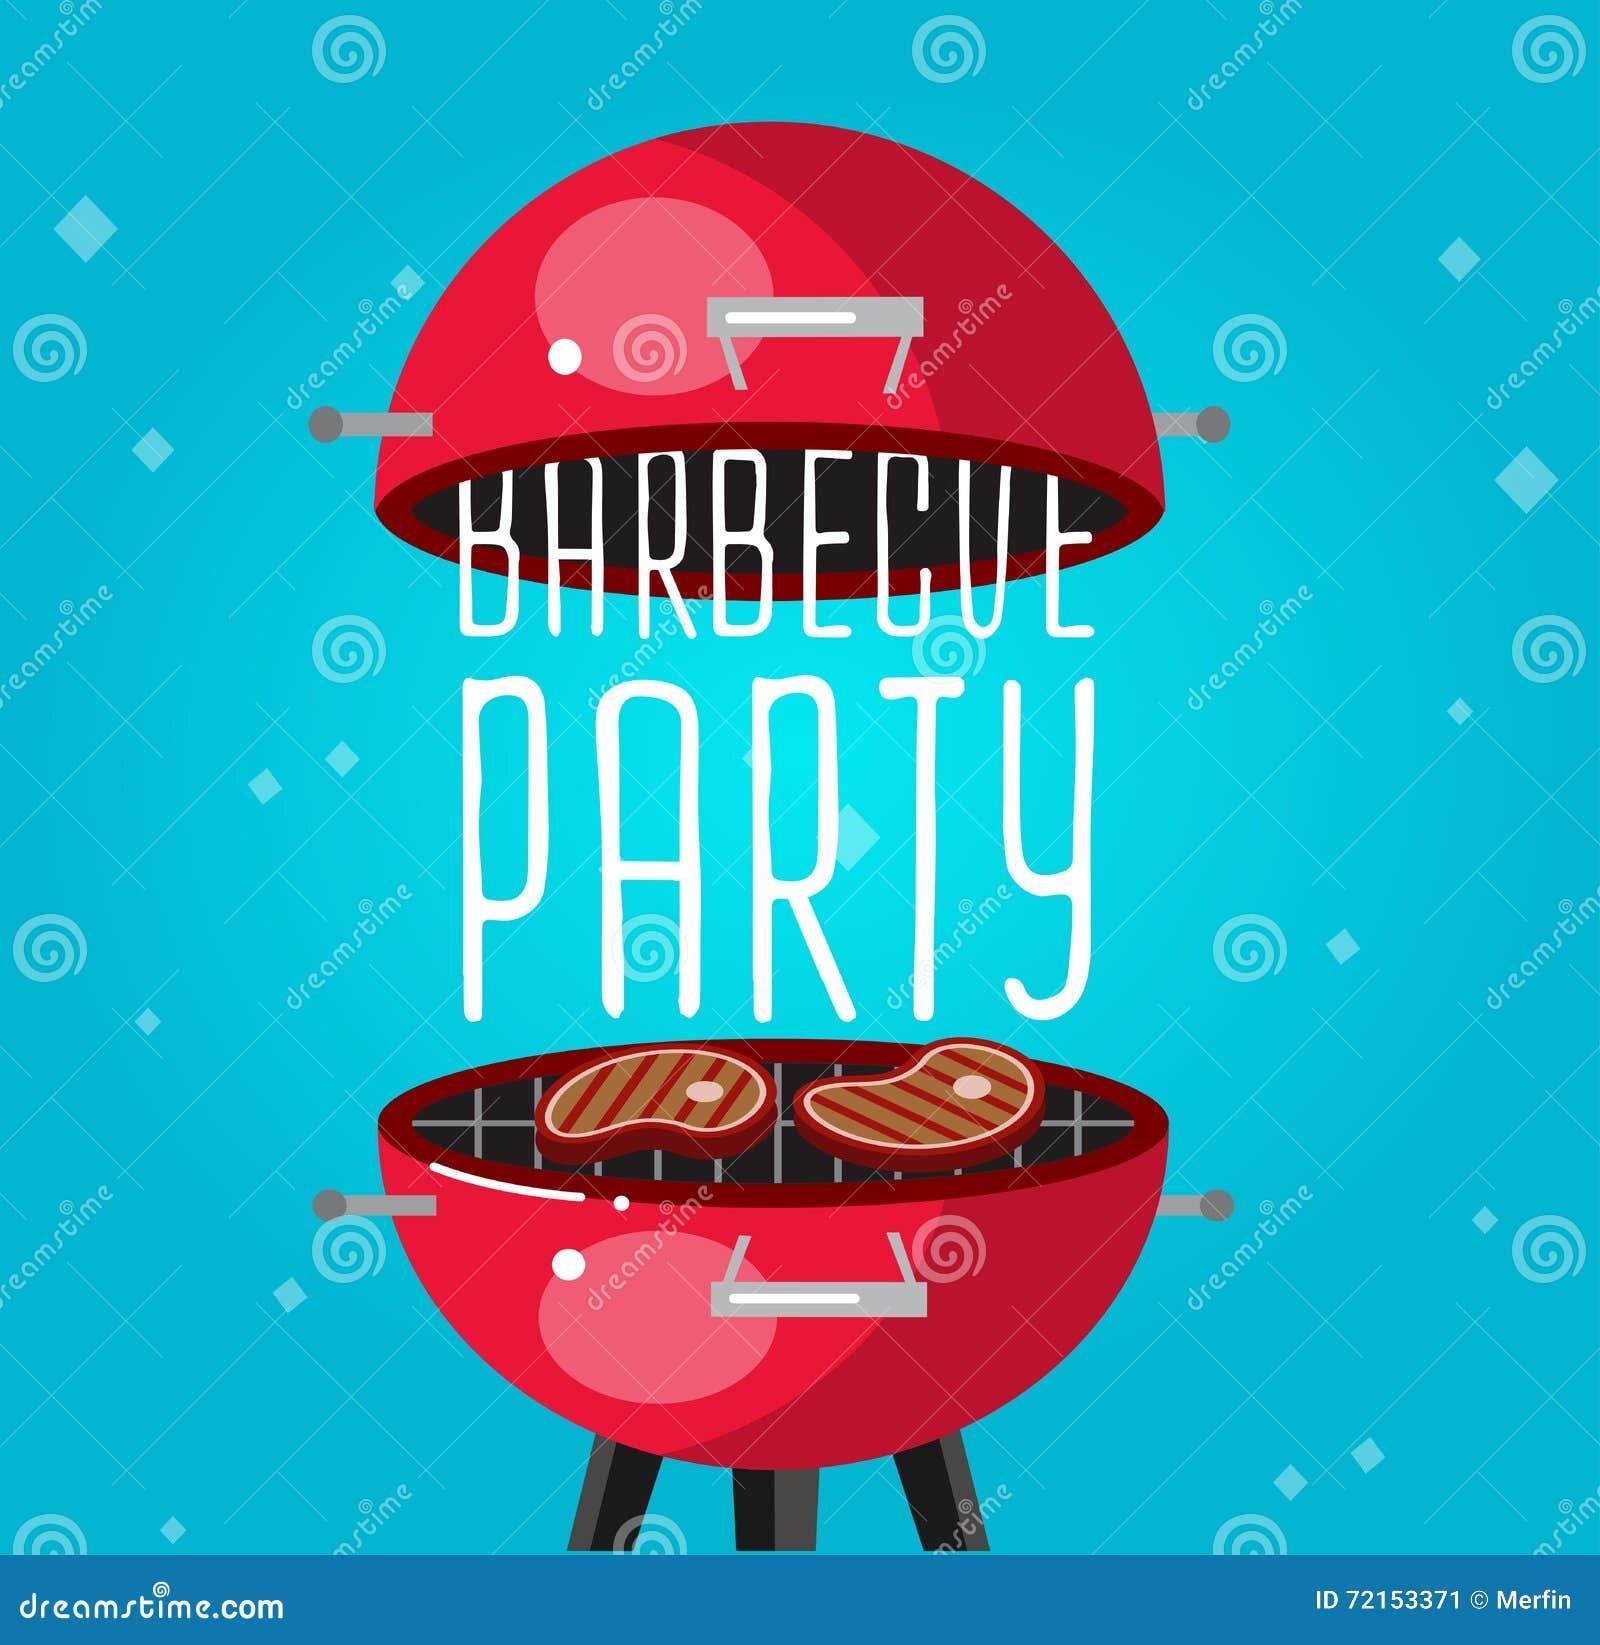 Różny mięso na grill ilustraci jakby